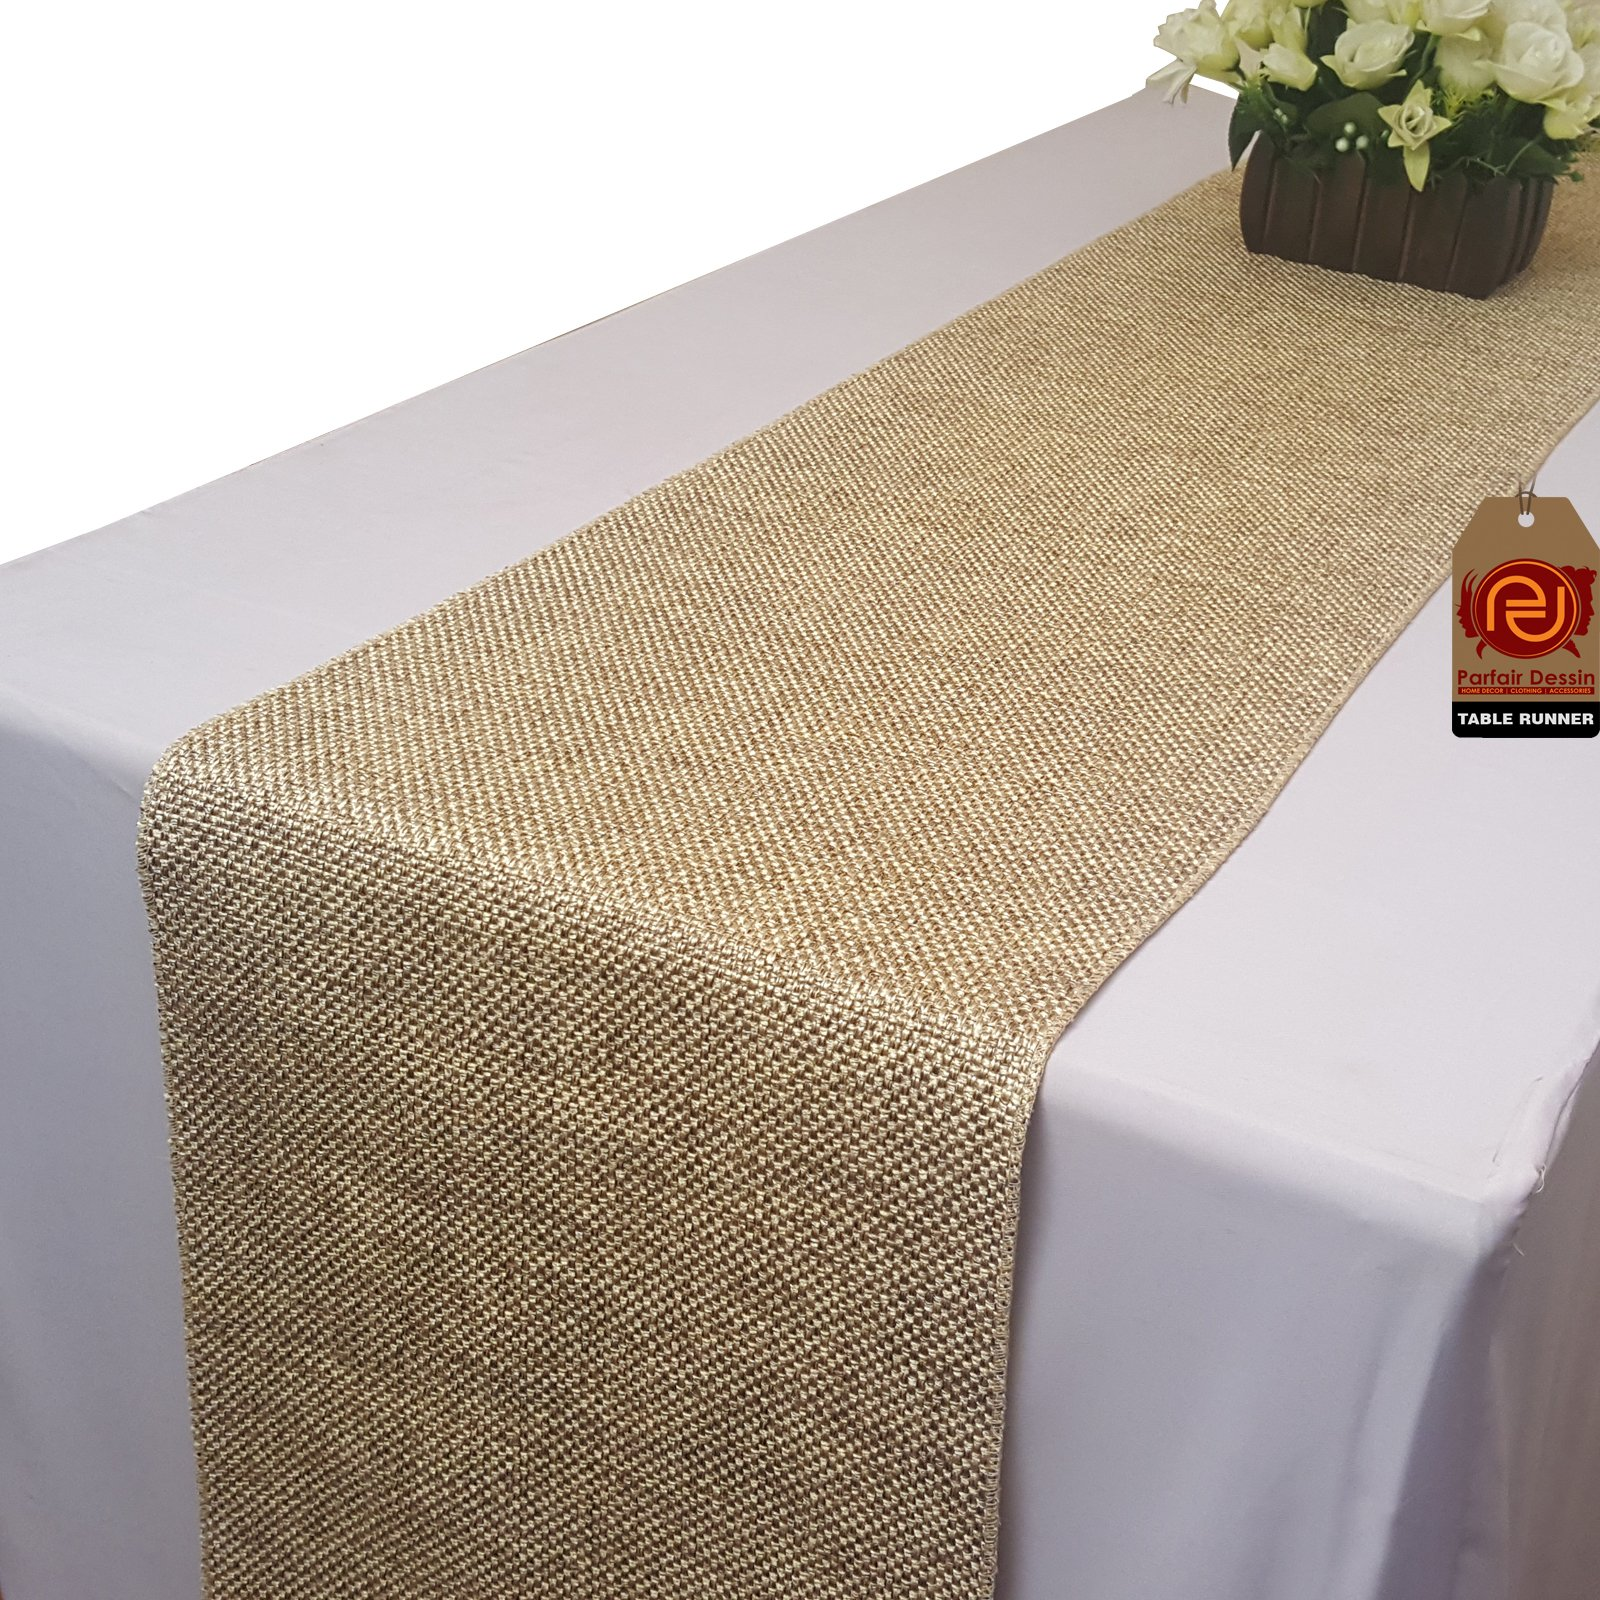 Parfair Dessin 13'' x 72'' Burlap Jute-Cotton High Density Fabric Table Runner: Natural TRAA2-72